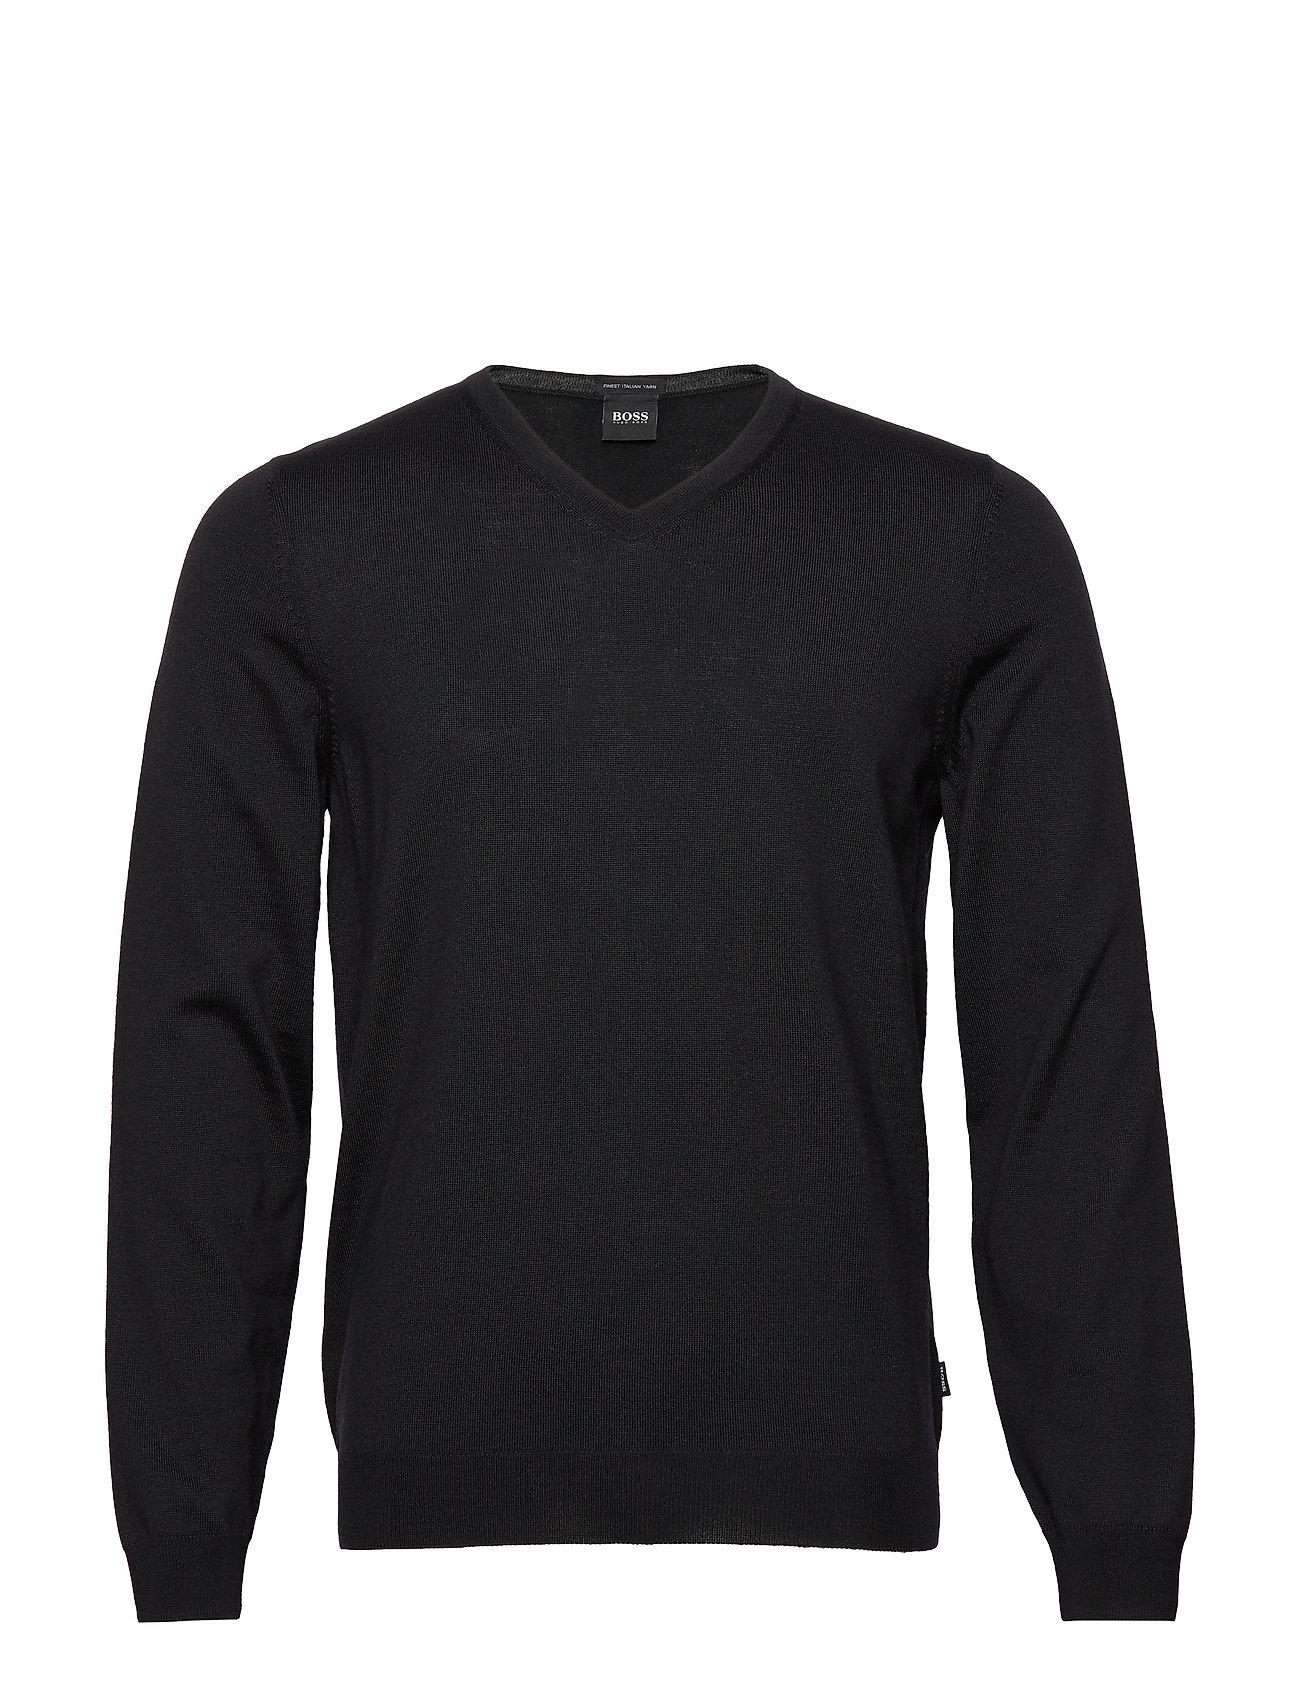 BOSS Business Wear Baram - BLACK